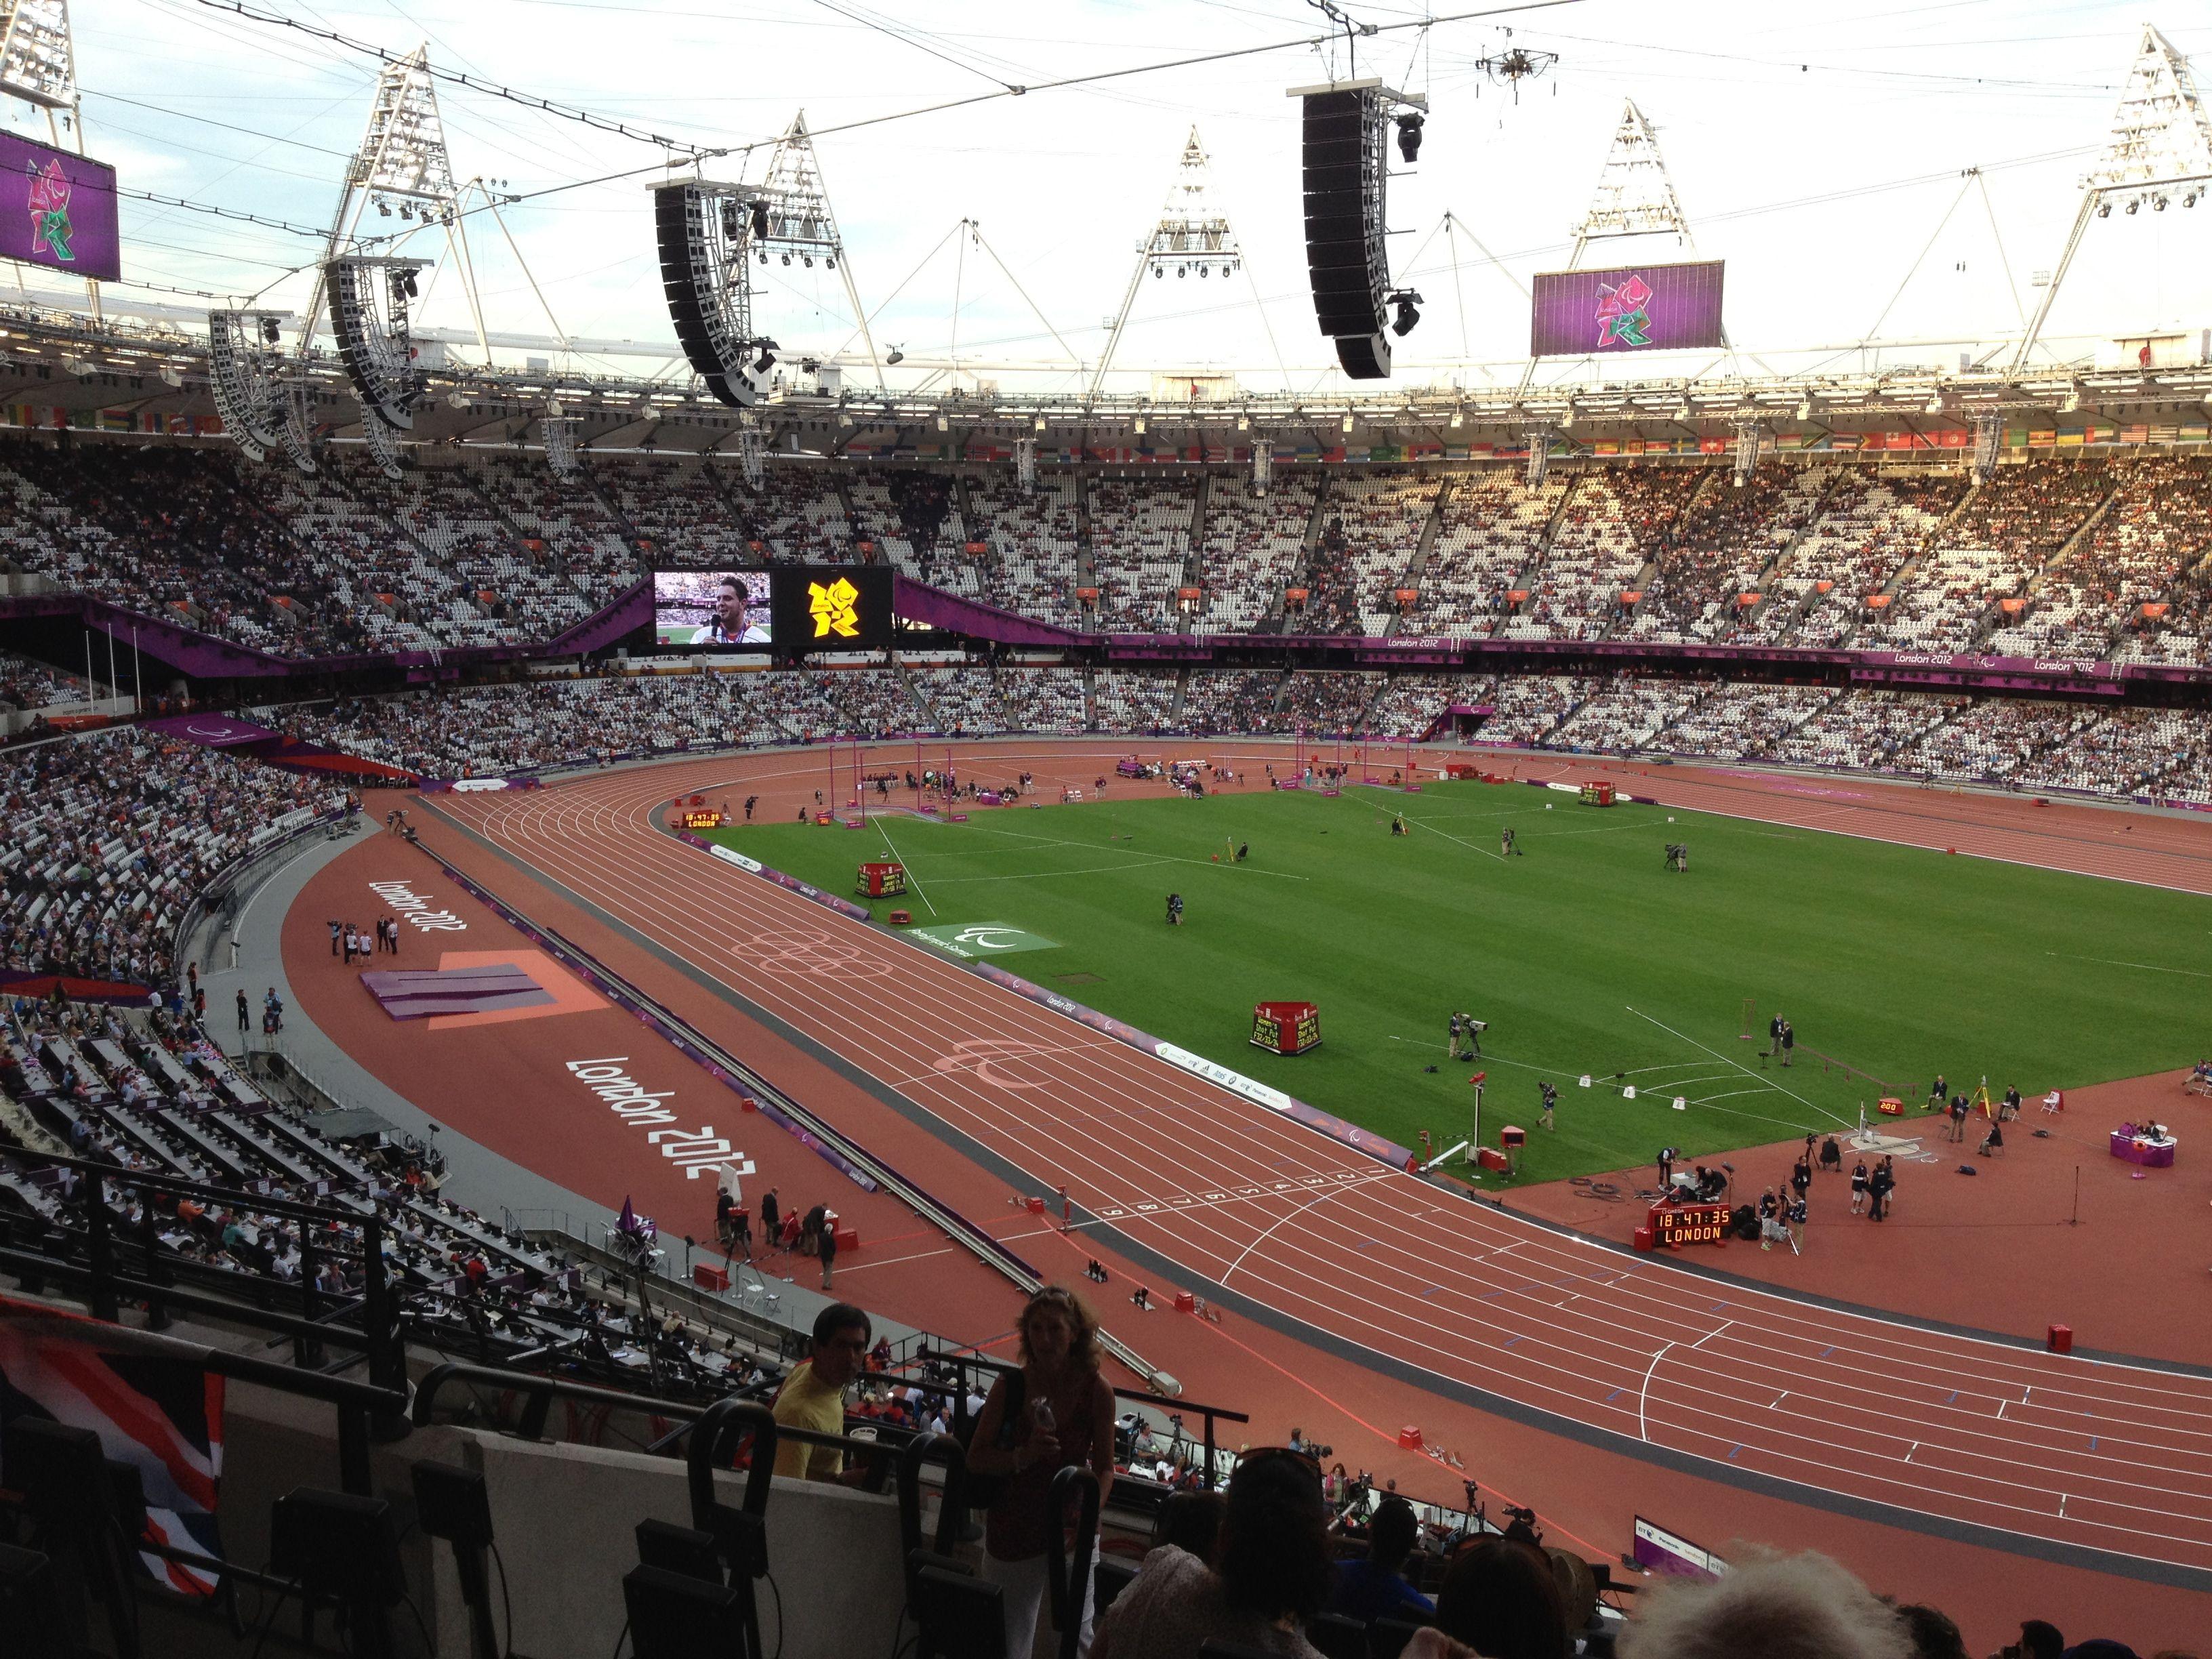 Olympic Stadium! Stadium, Olympics, Baseball field